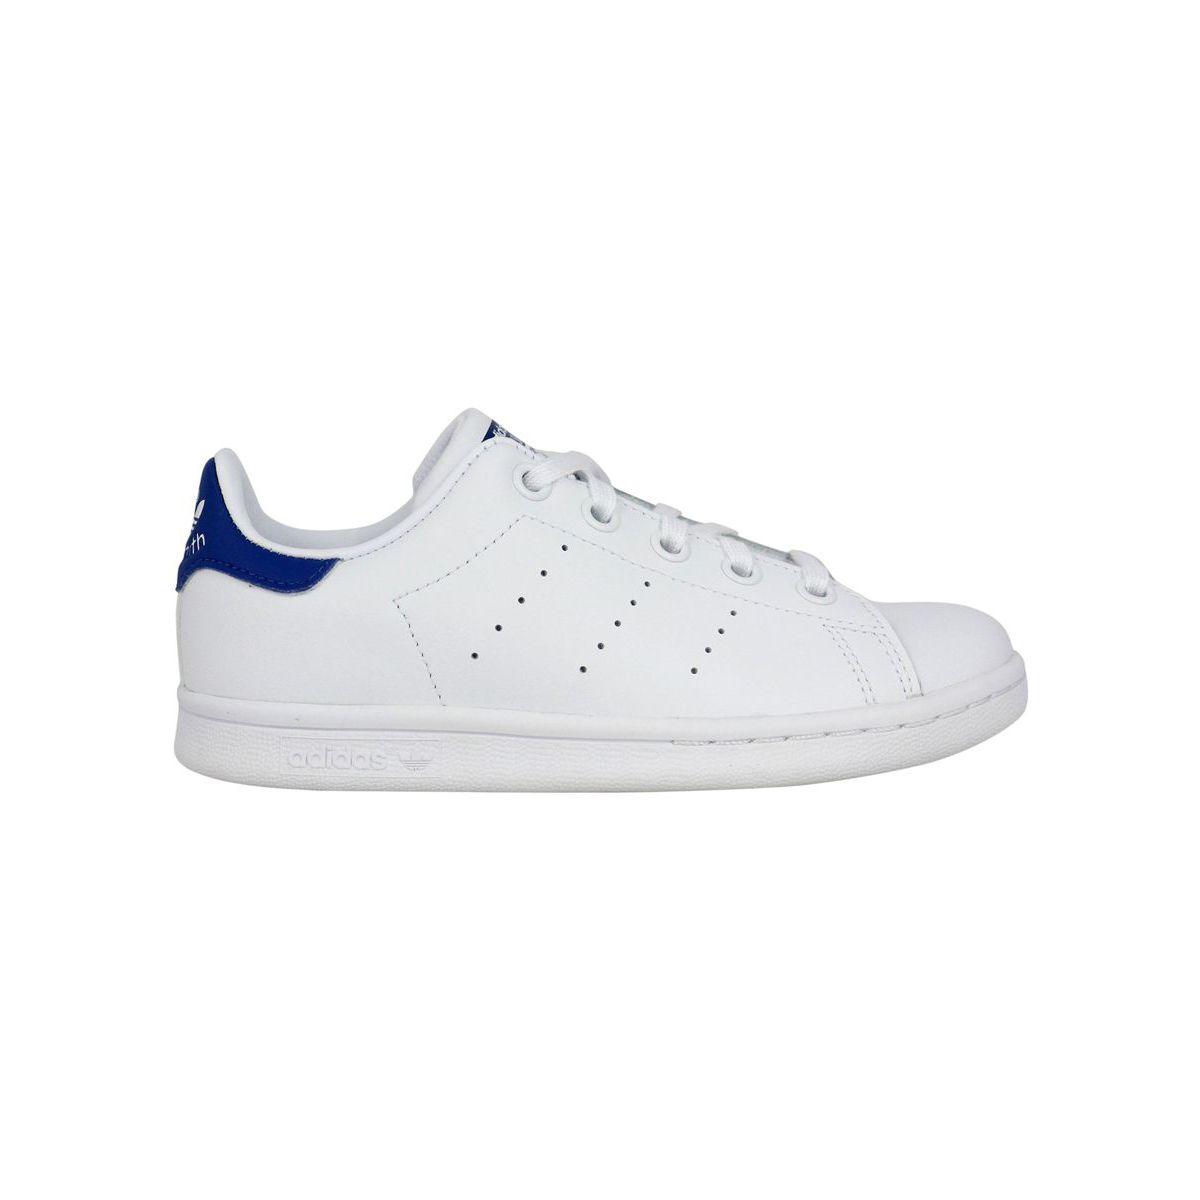 Sneakers Stan Smith C in pelle con tallone a contrasto